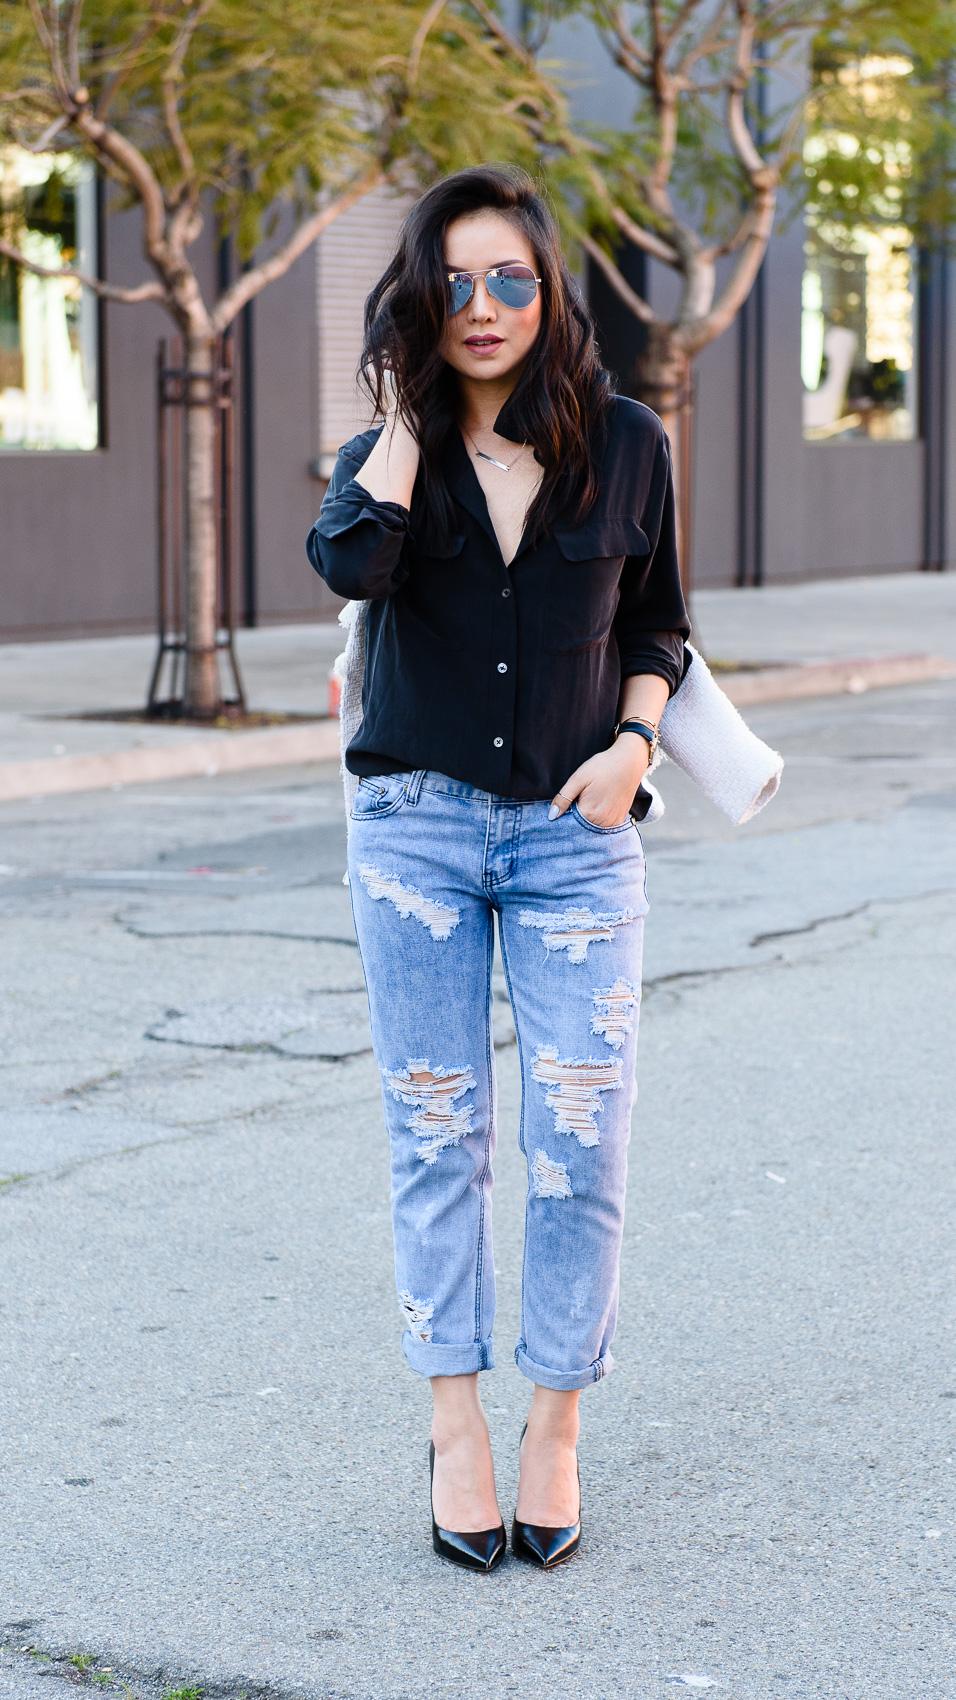 OOTD: Little Black Shirt - The Fancy Pants Report | San Francisco ...